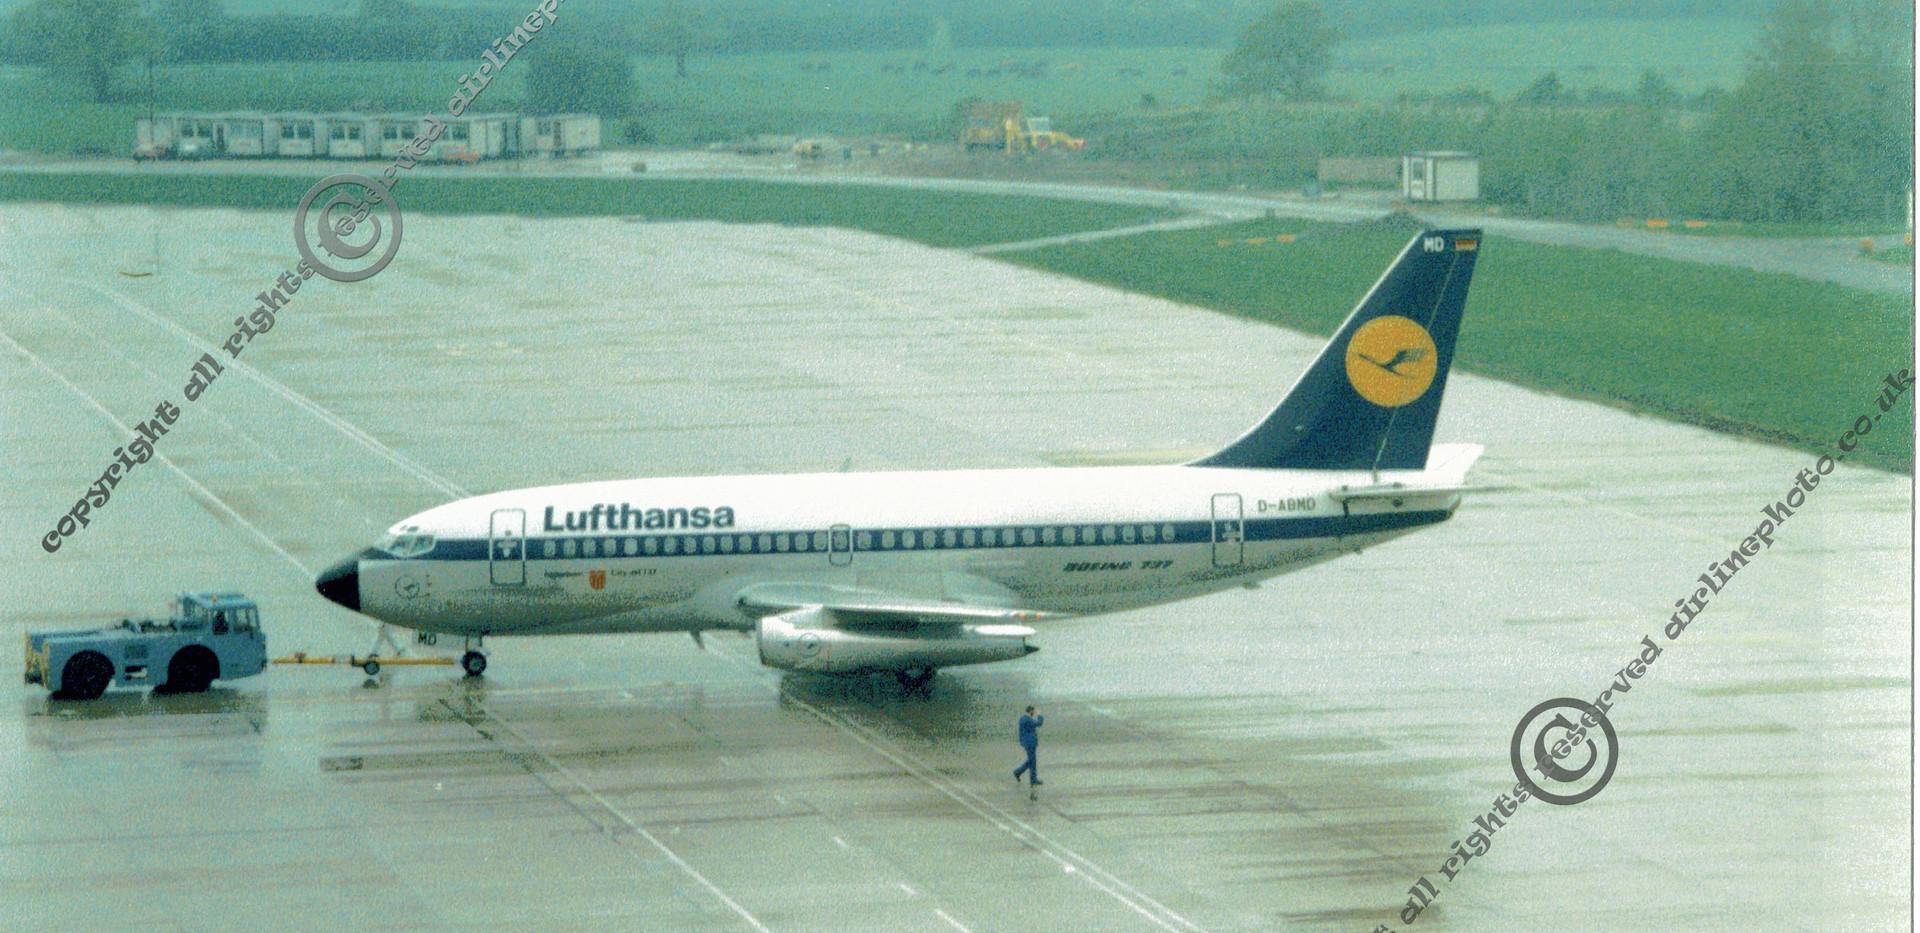 D-AMD_Lufthansa_737_MAN_1986.jpg